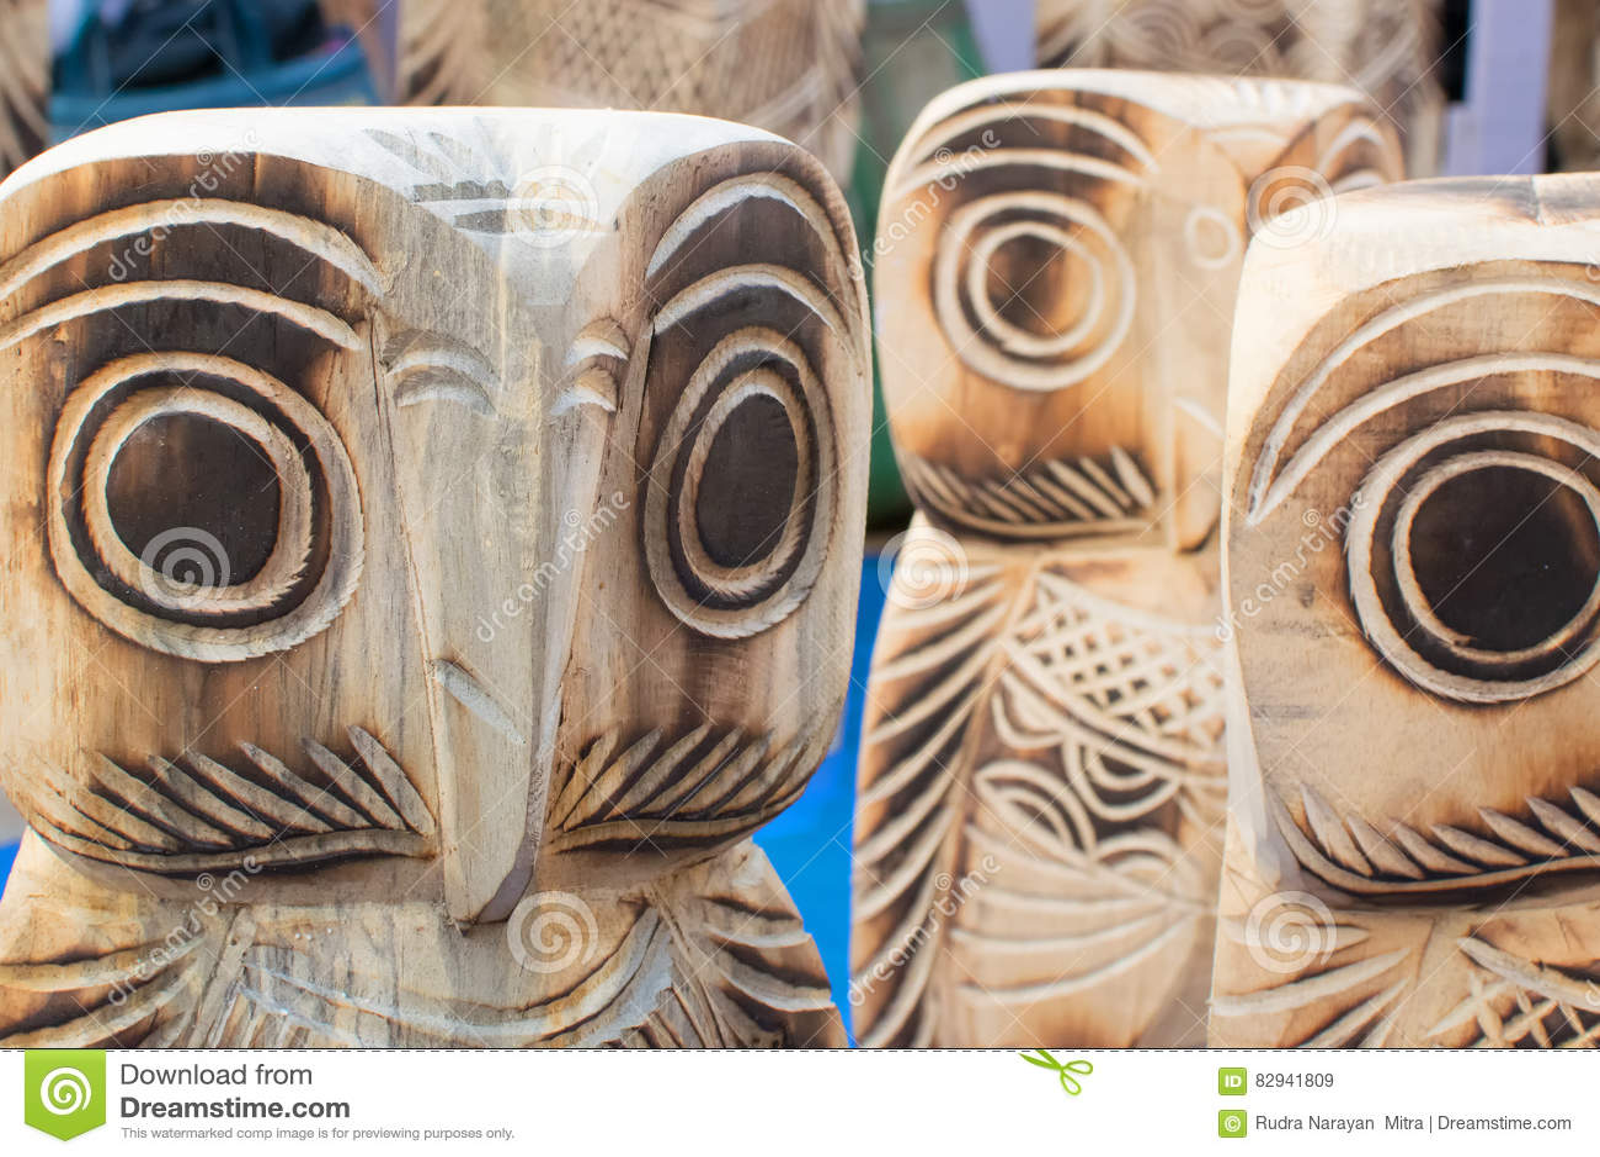 Wooden Owls Handicraft Items On Display Kolkata Stock Image